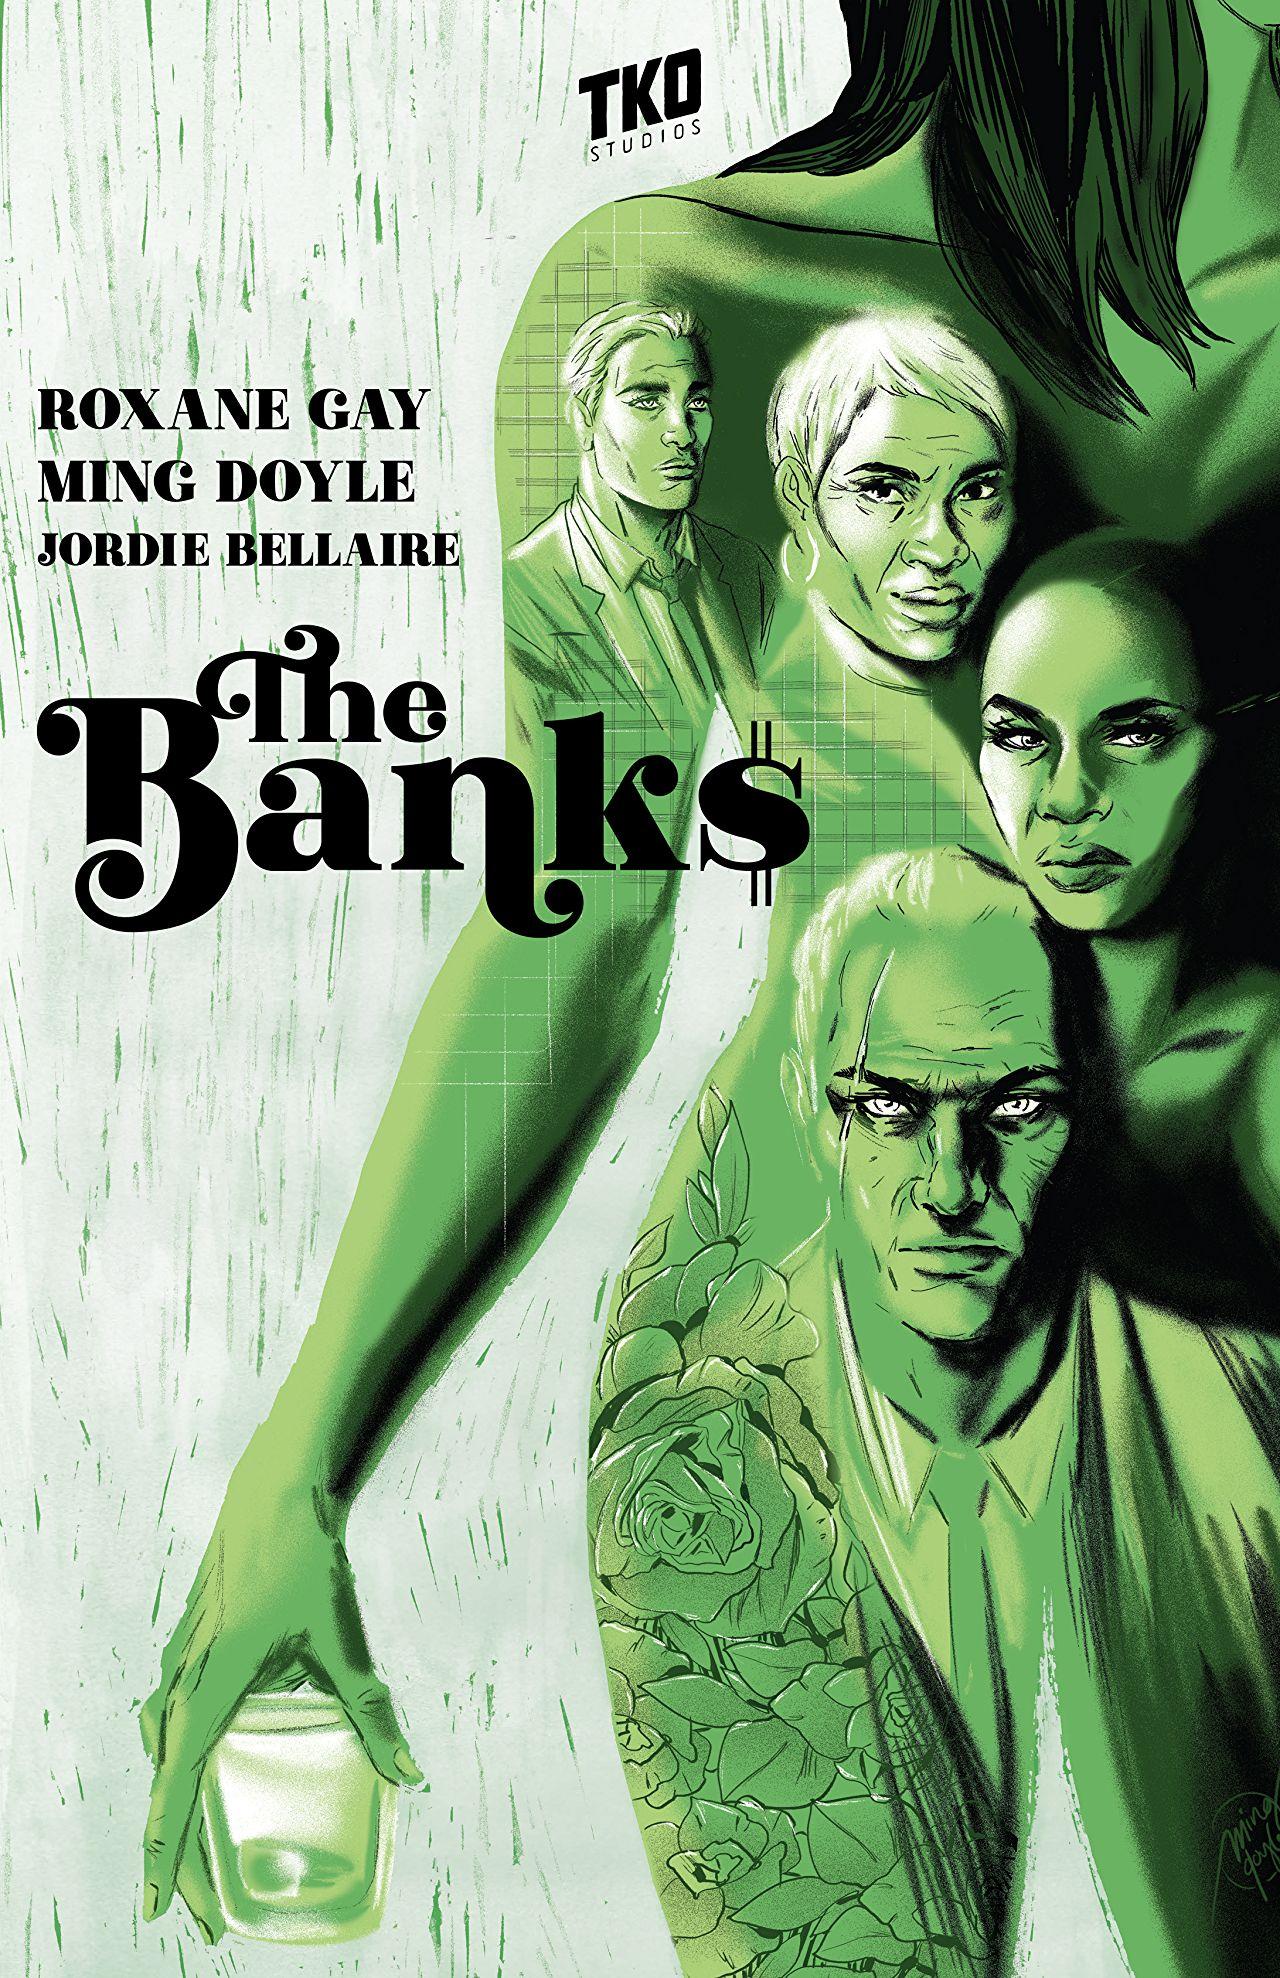 The Banks, TKO